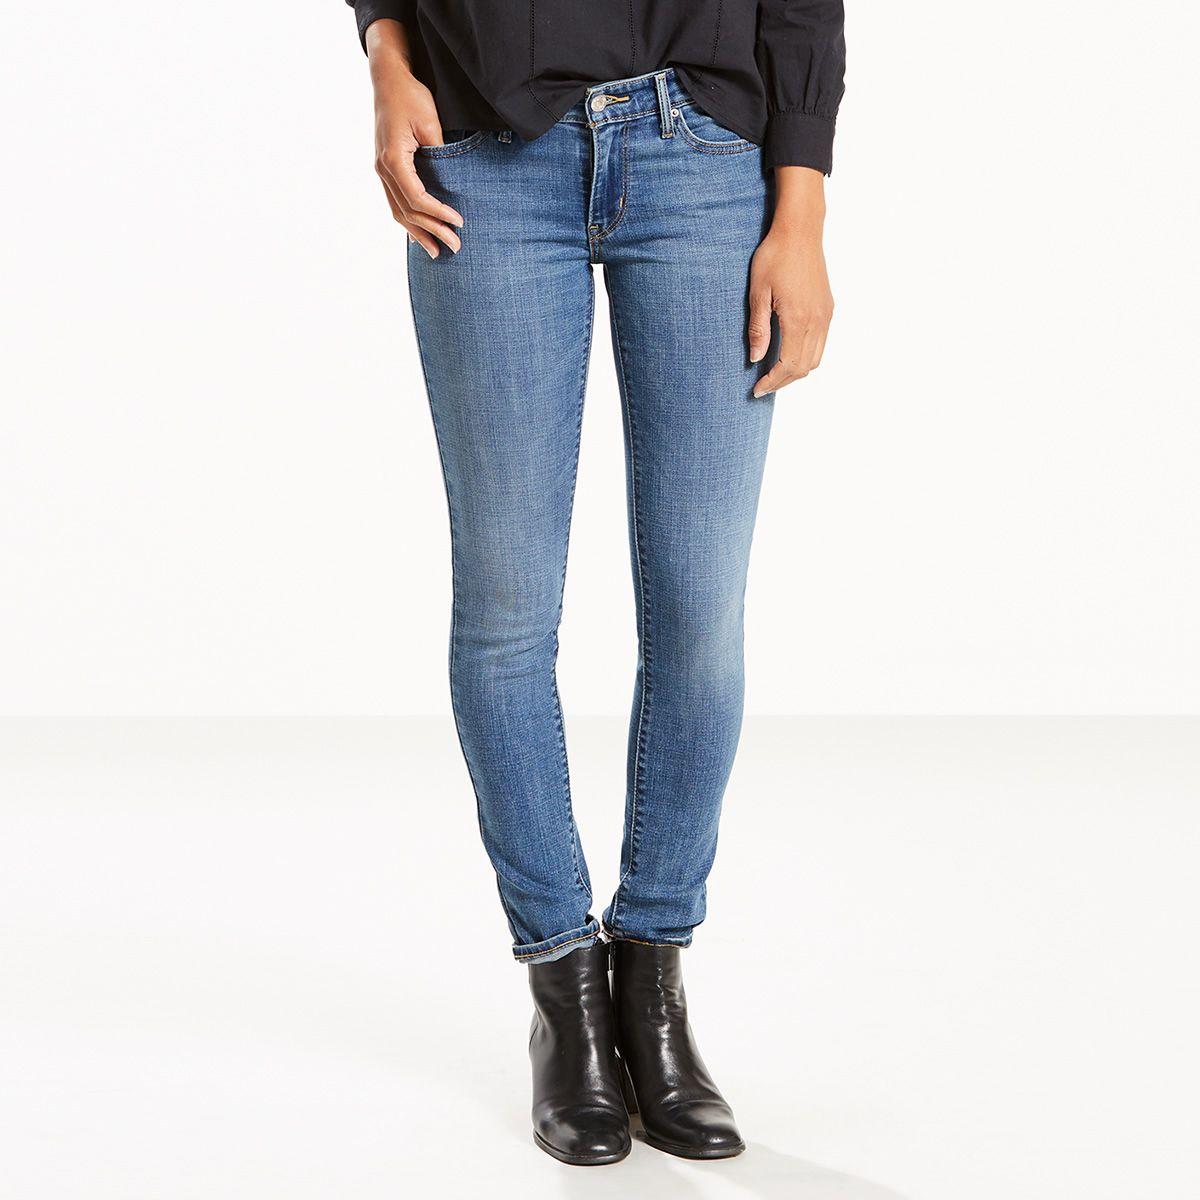 18e1e9ac899 Bootcut Womens Levis Jeans   Denim Apparel - Macy s